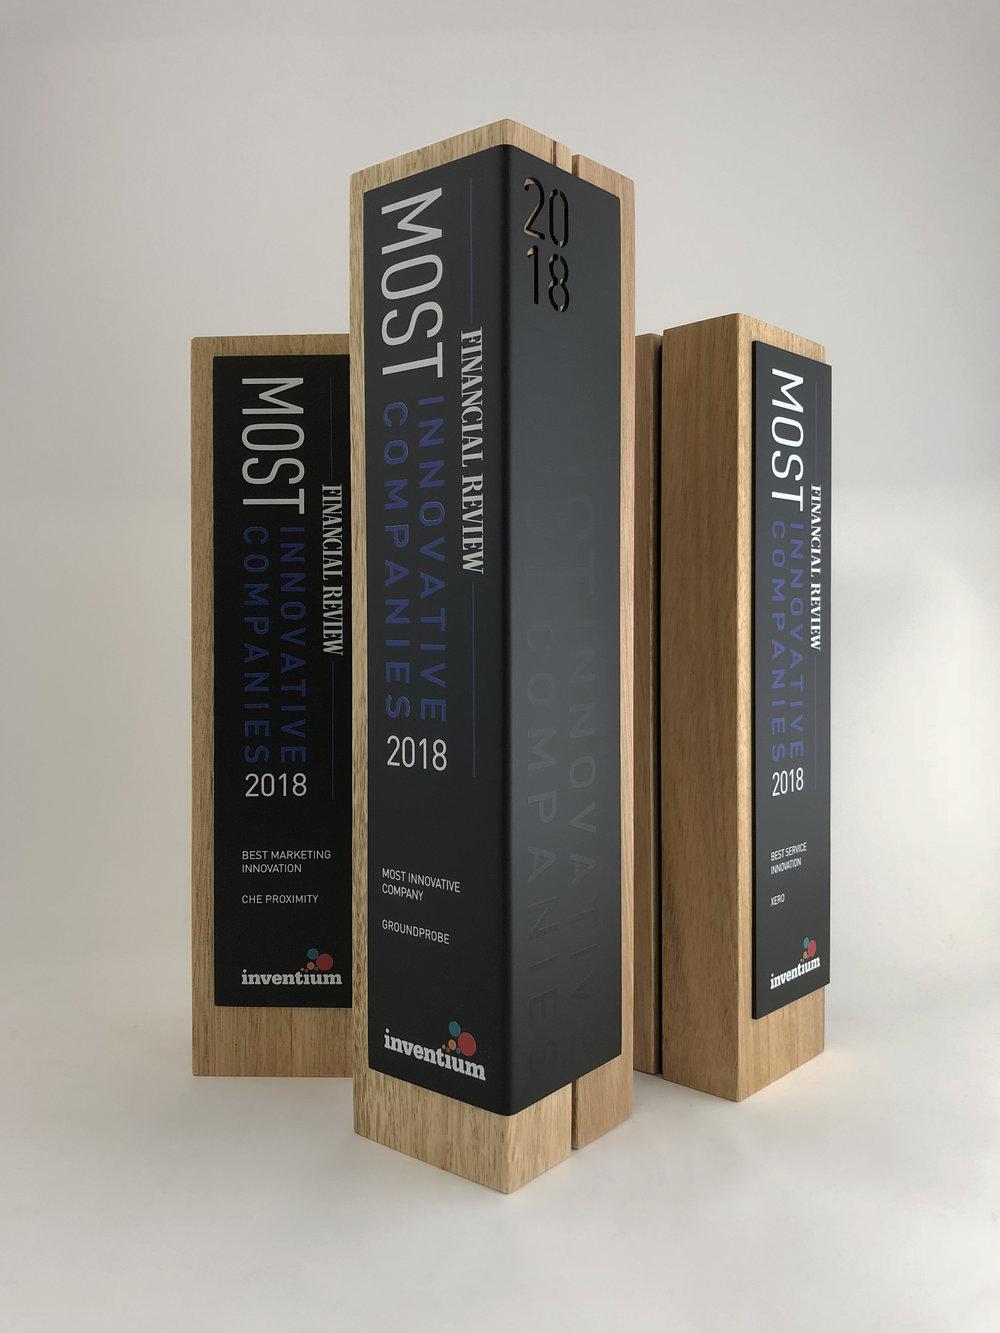 most-innovative-companies-awards-timber-metal-trophy-04.jpg